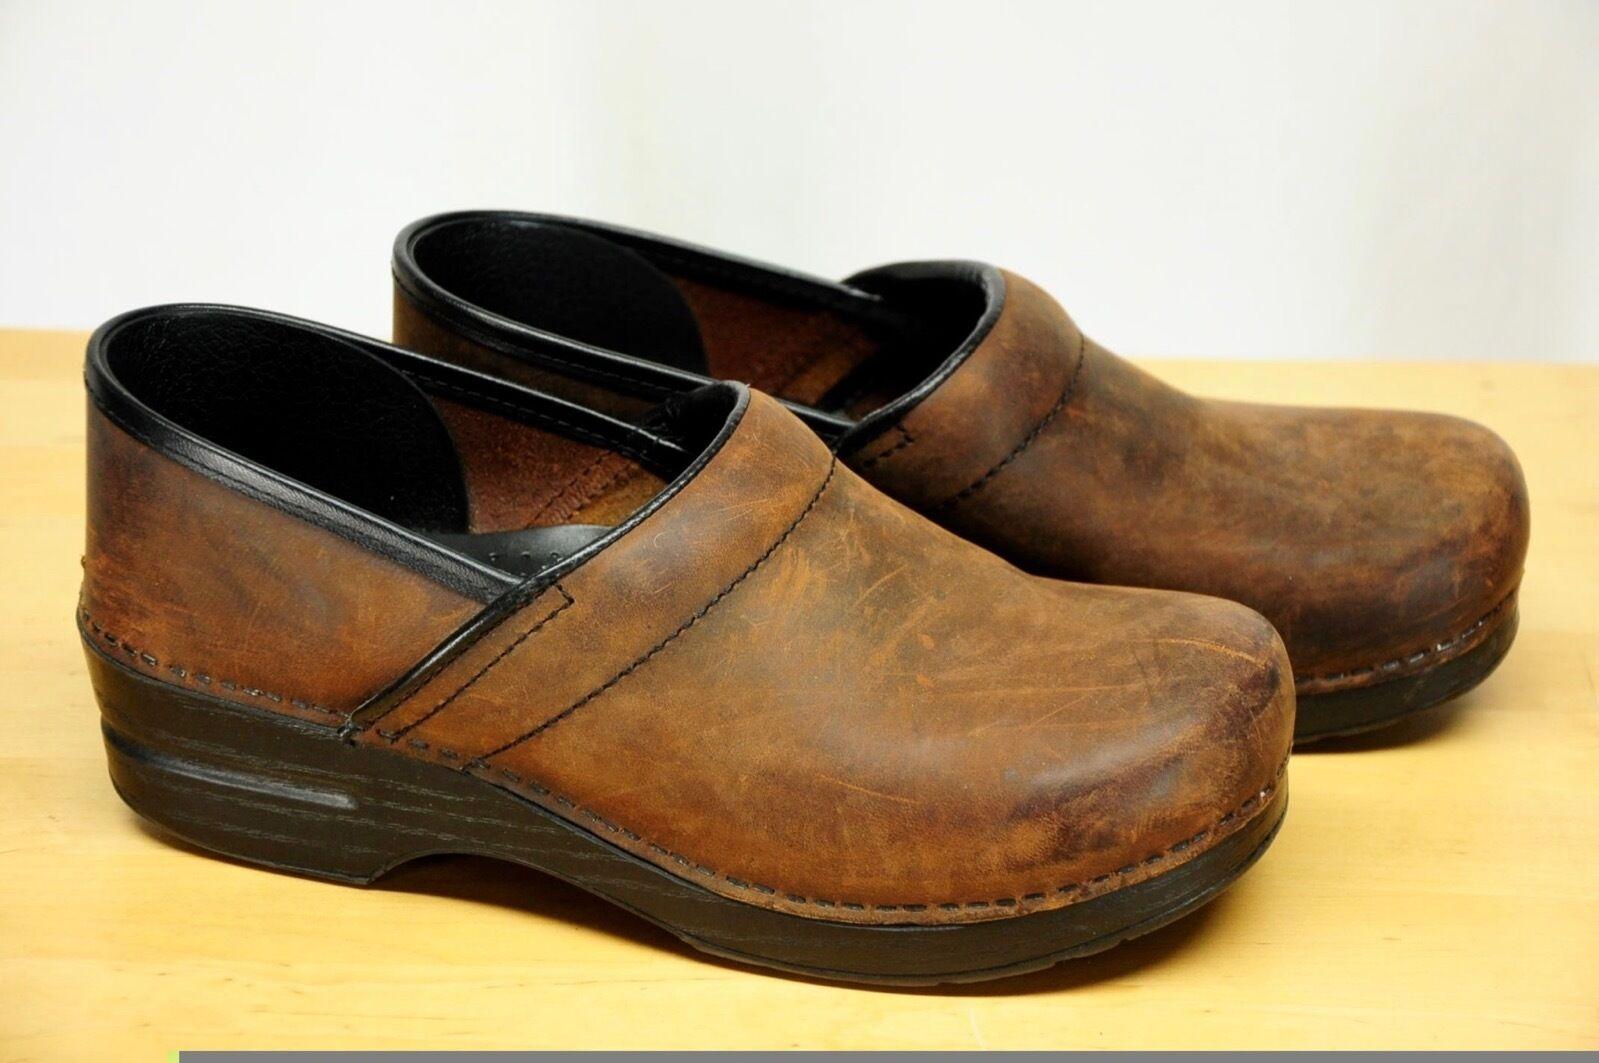 Dansko Professional Antique Brown/Black Oiled Leather Clogs sz: 40 / US 9.5